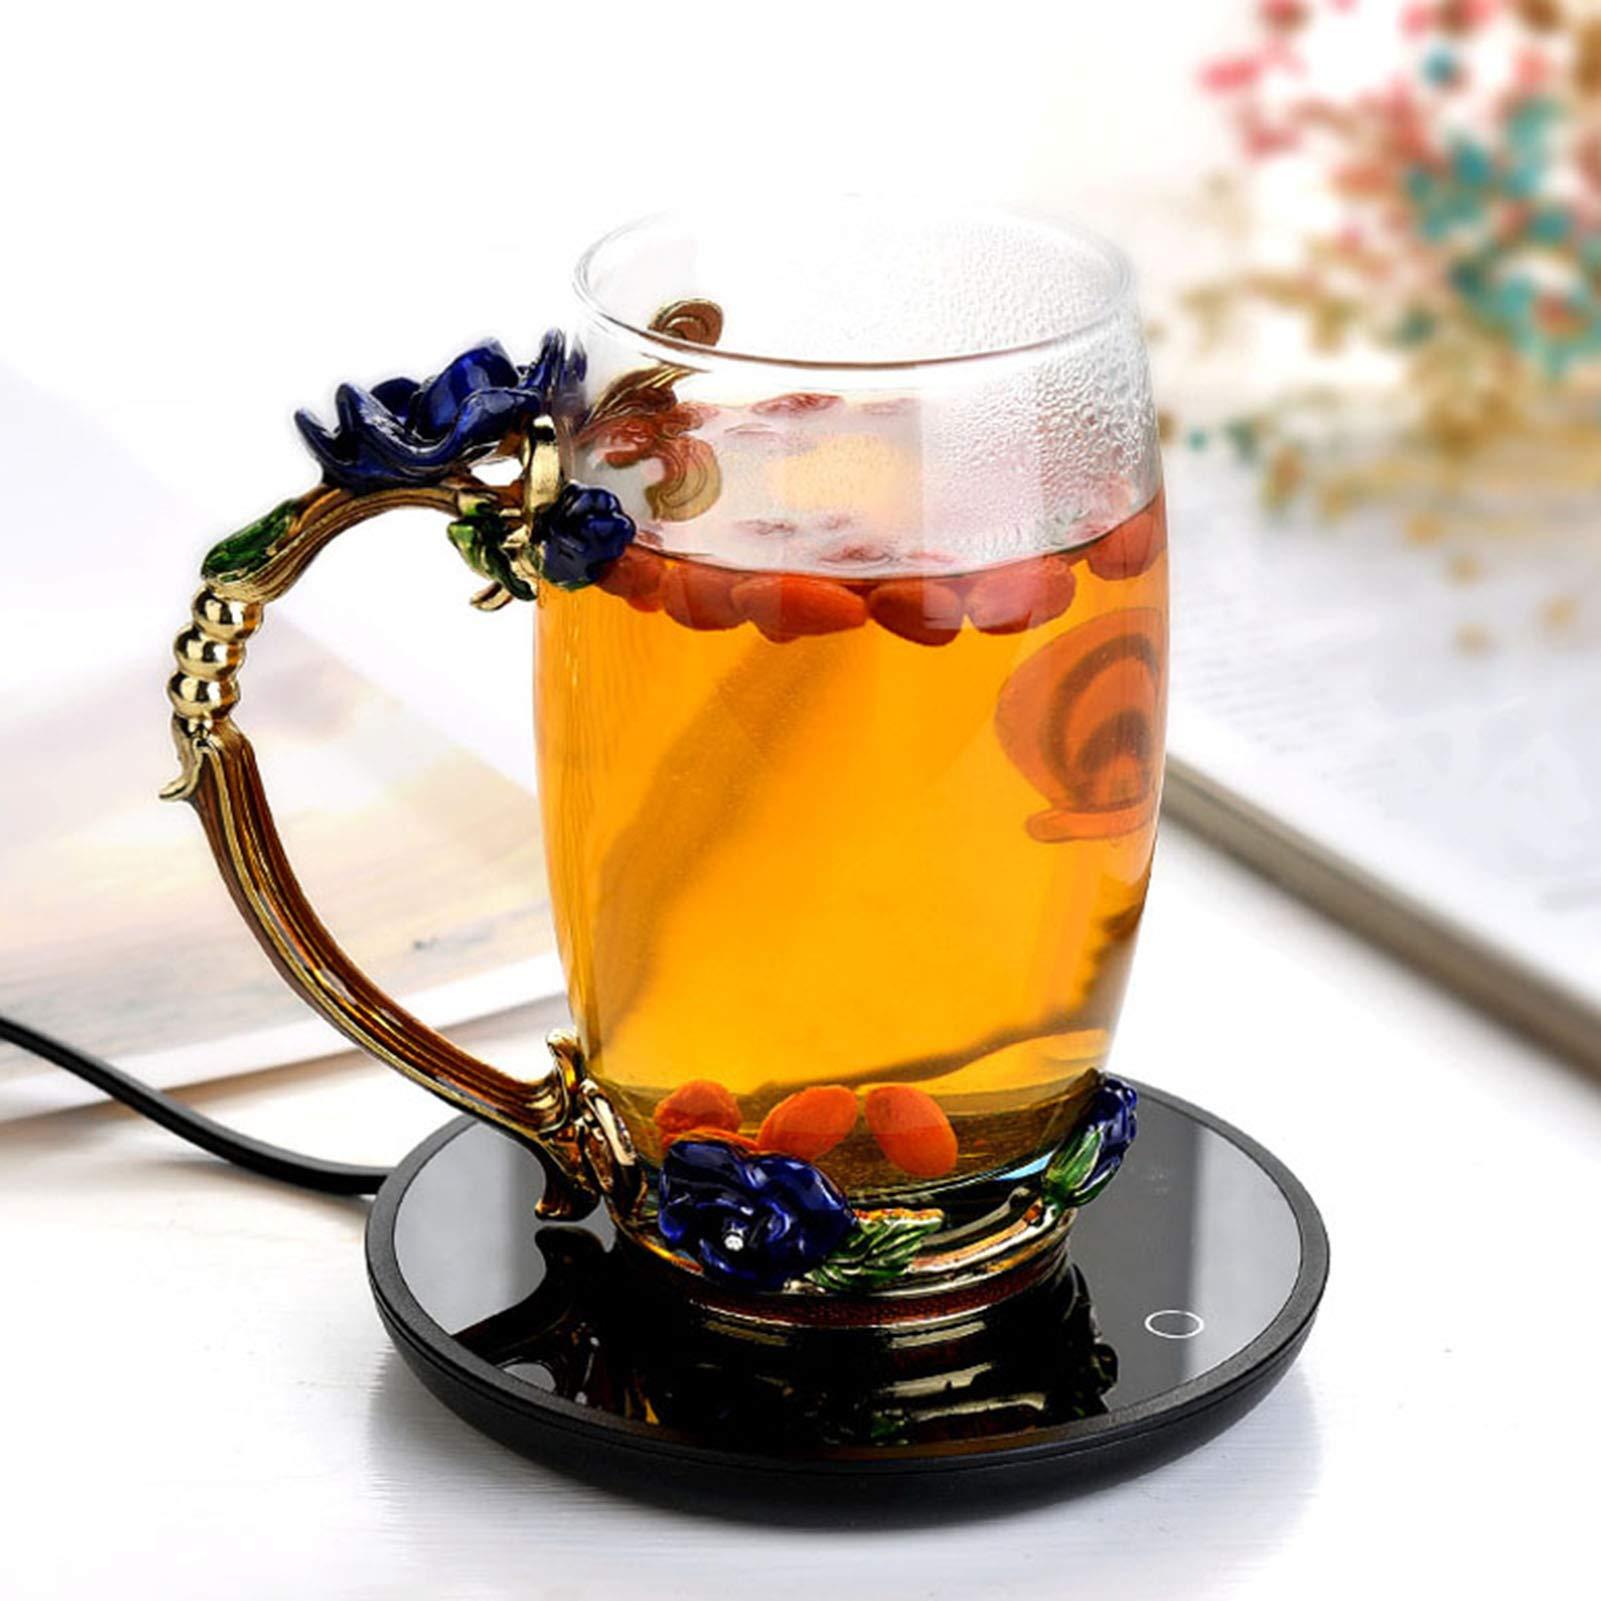 Lantsang Coffee Mug Warmer,USB Thermal Insulation Heating Coaster,Equipped with a Coffee Tea Room and Home Milk Warmer (Black)